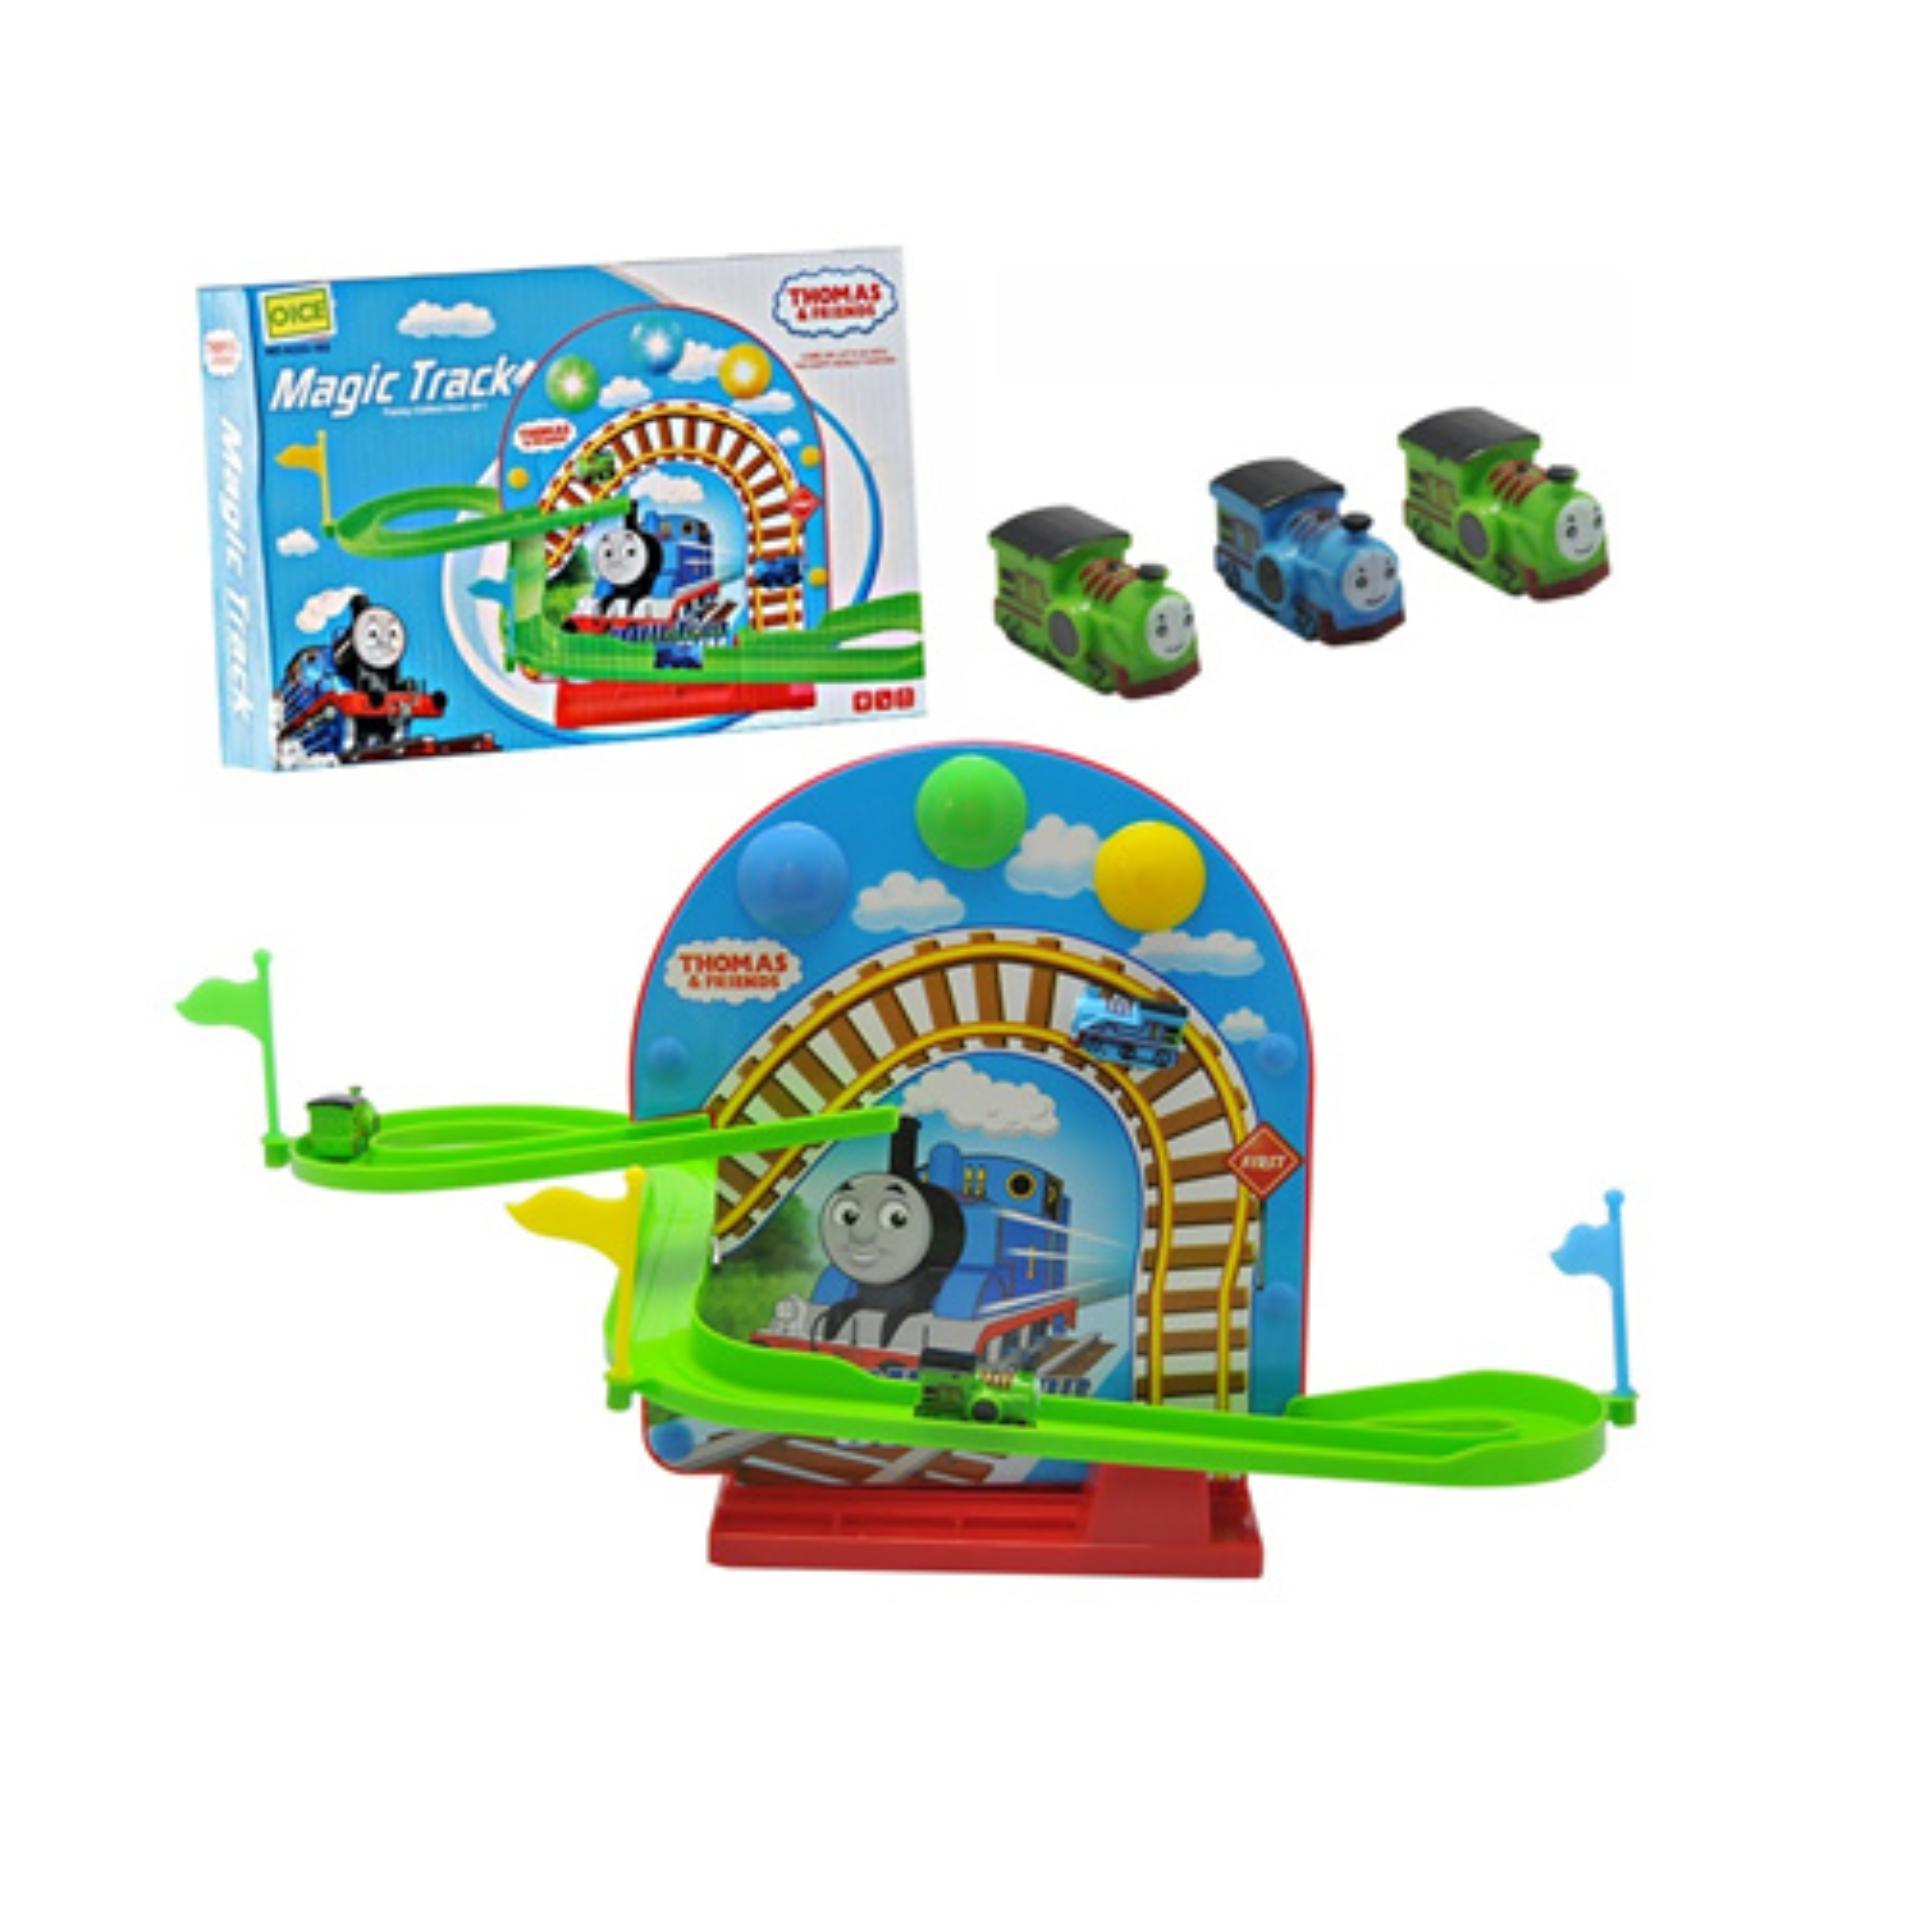 ... AA Toys Thomas Train Track A333-193 - Magic Track Mainan Kereta API ...